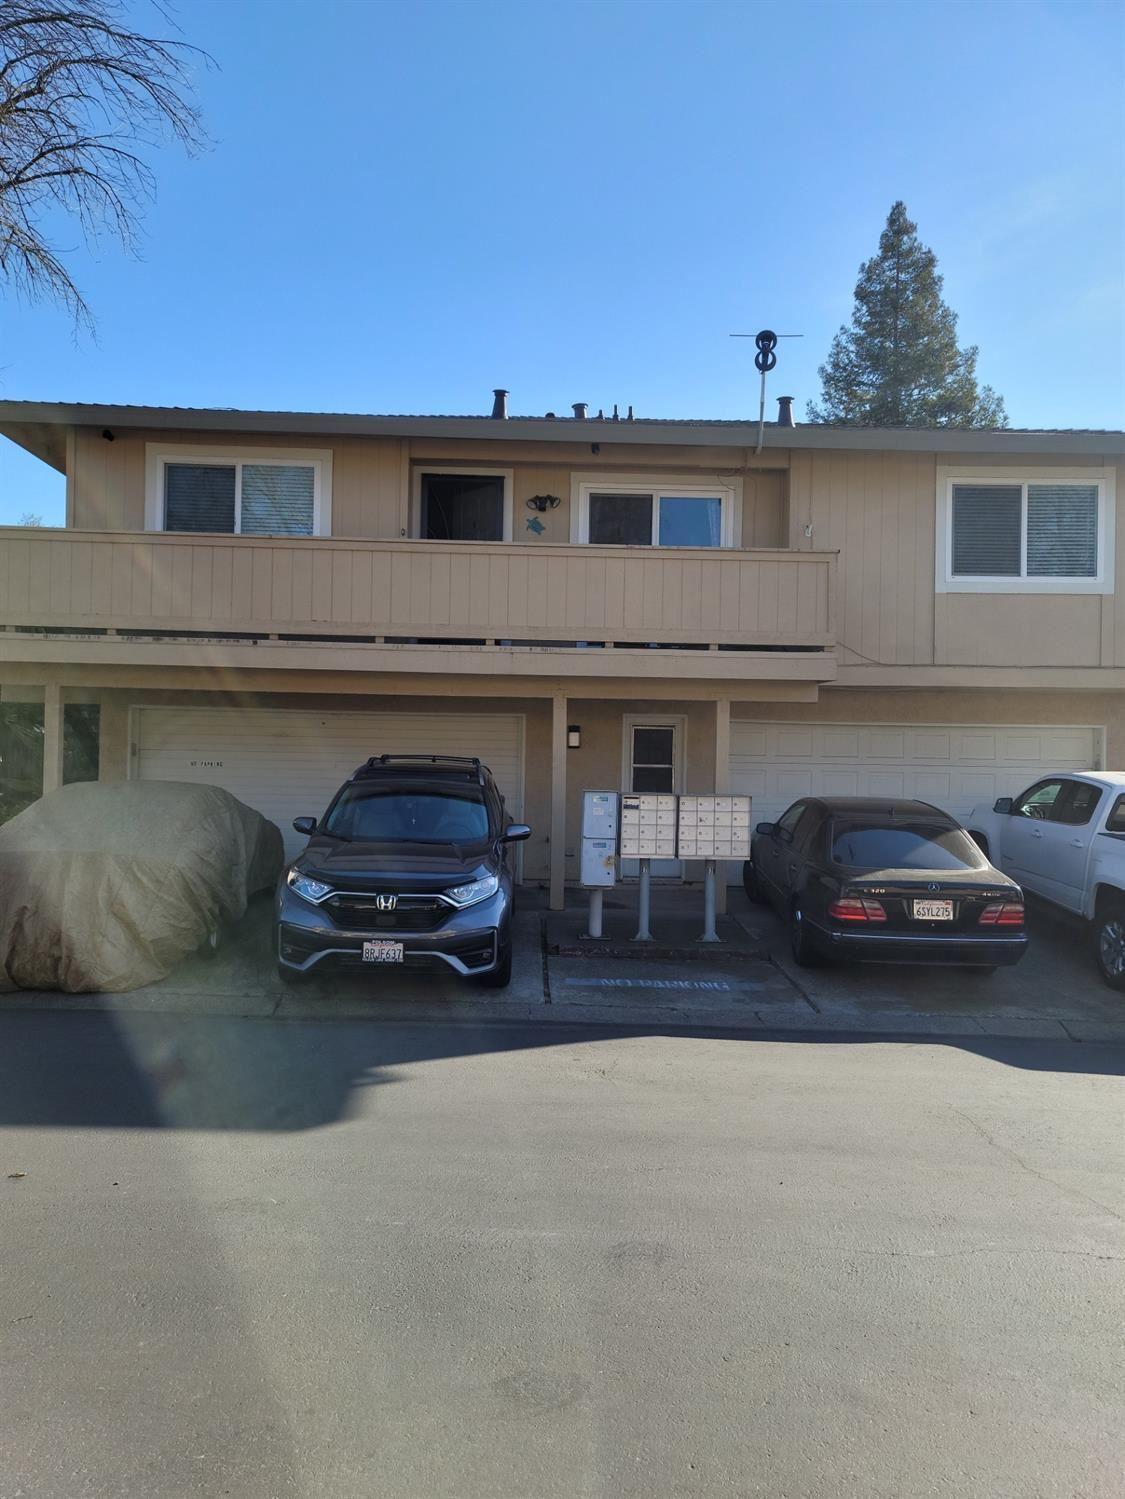 Photo of 5313 Winfield Way #4, Sacramento, CA 95841 (MLS # 221015430)